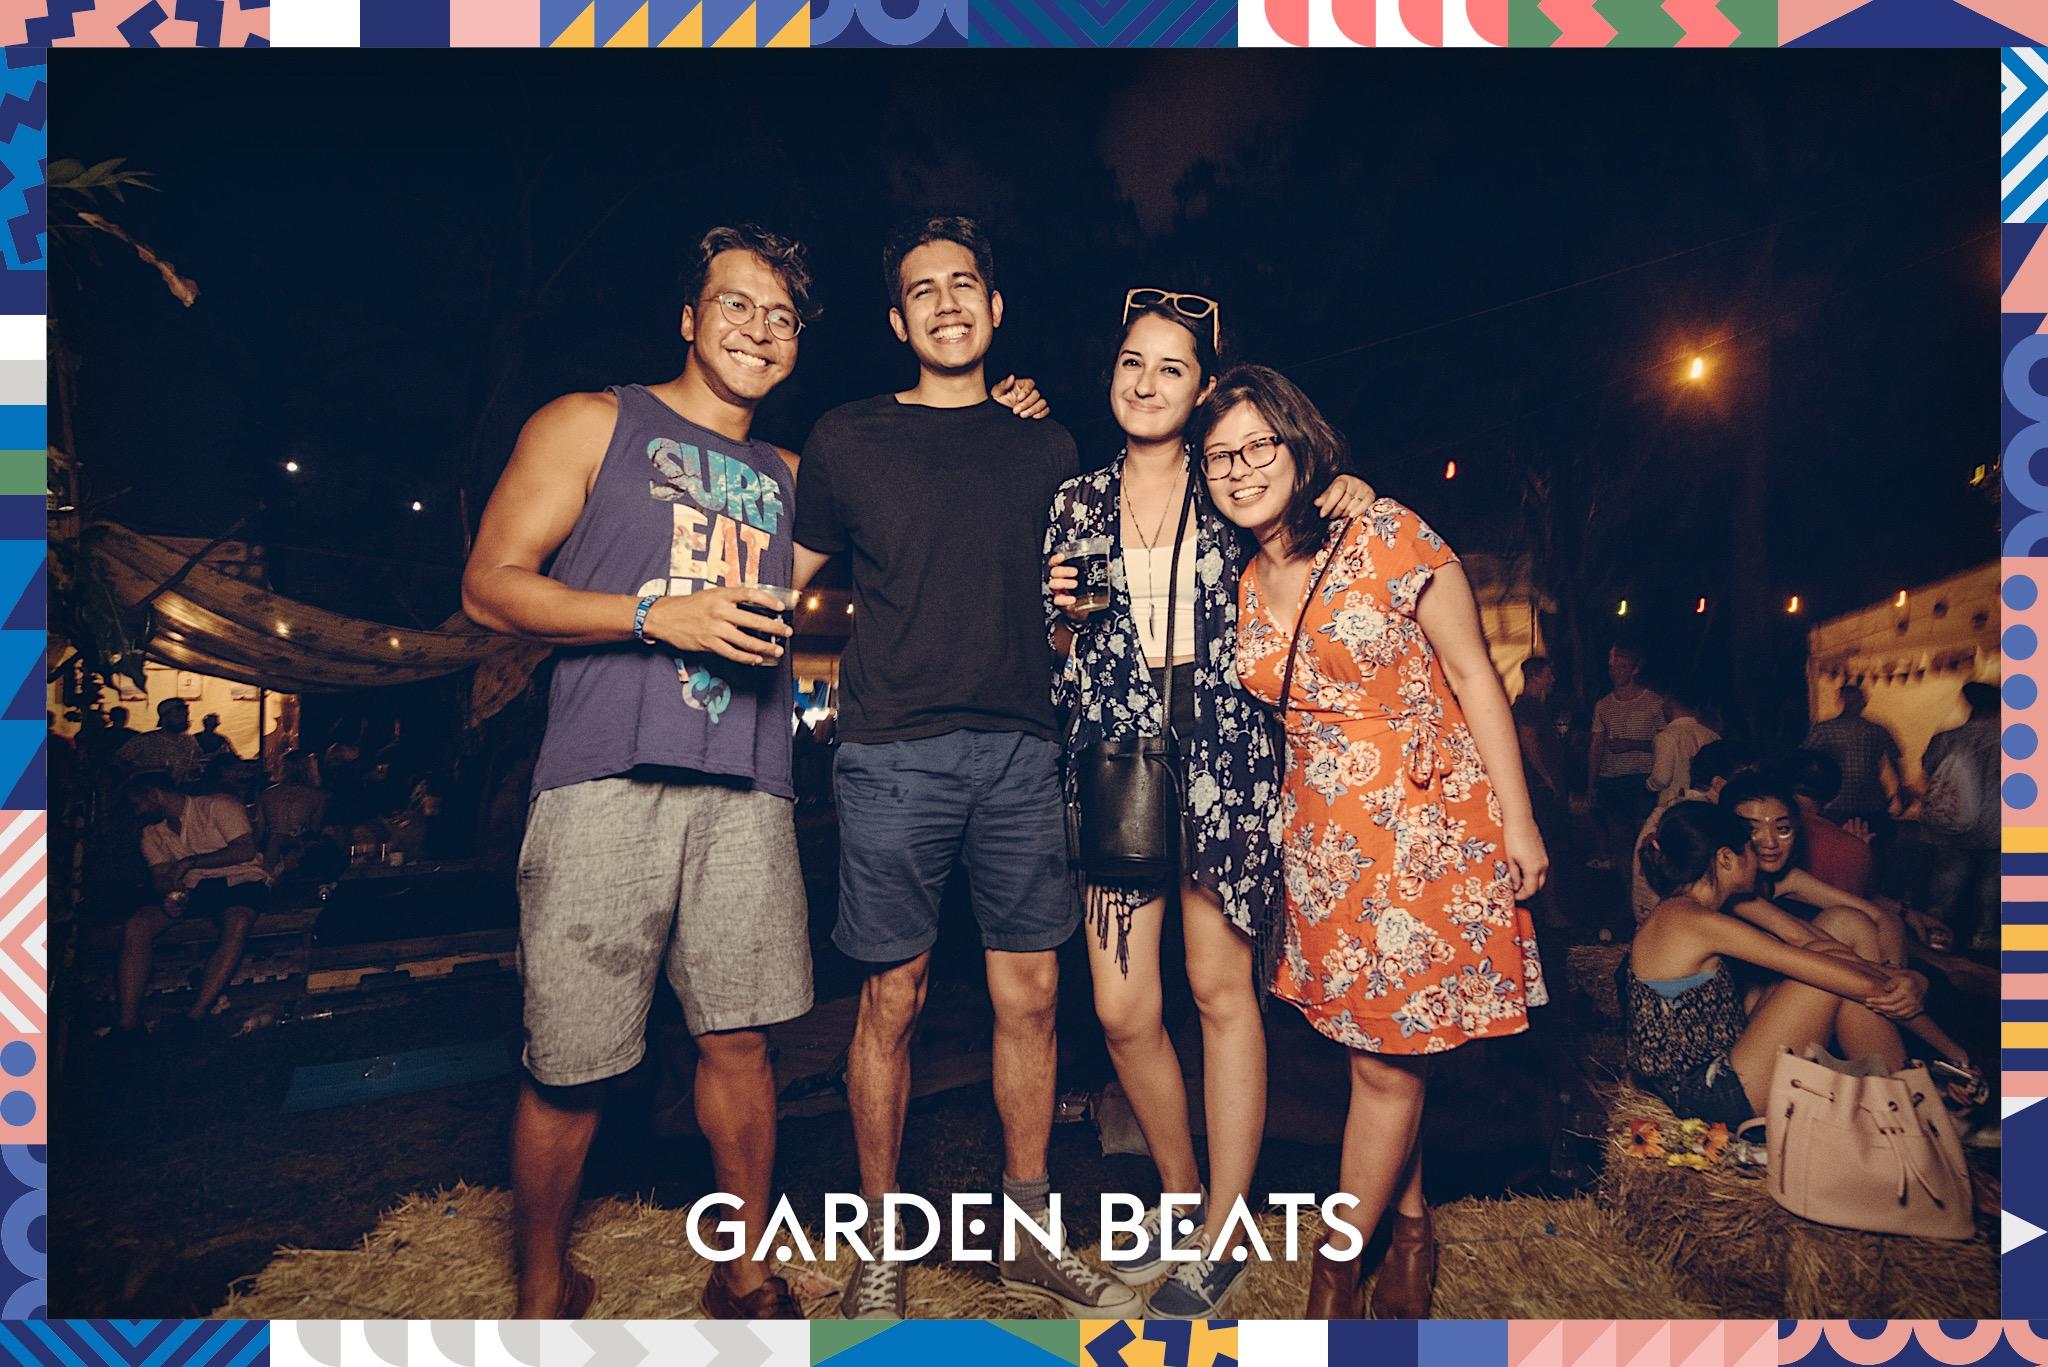 18032017_GardenBeats_Colossal866_WatermarkedGB.jpg